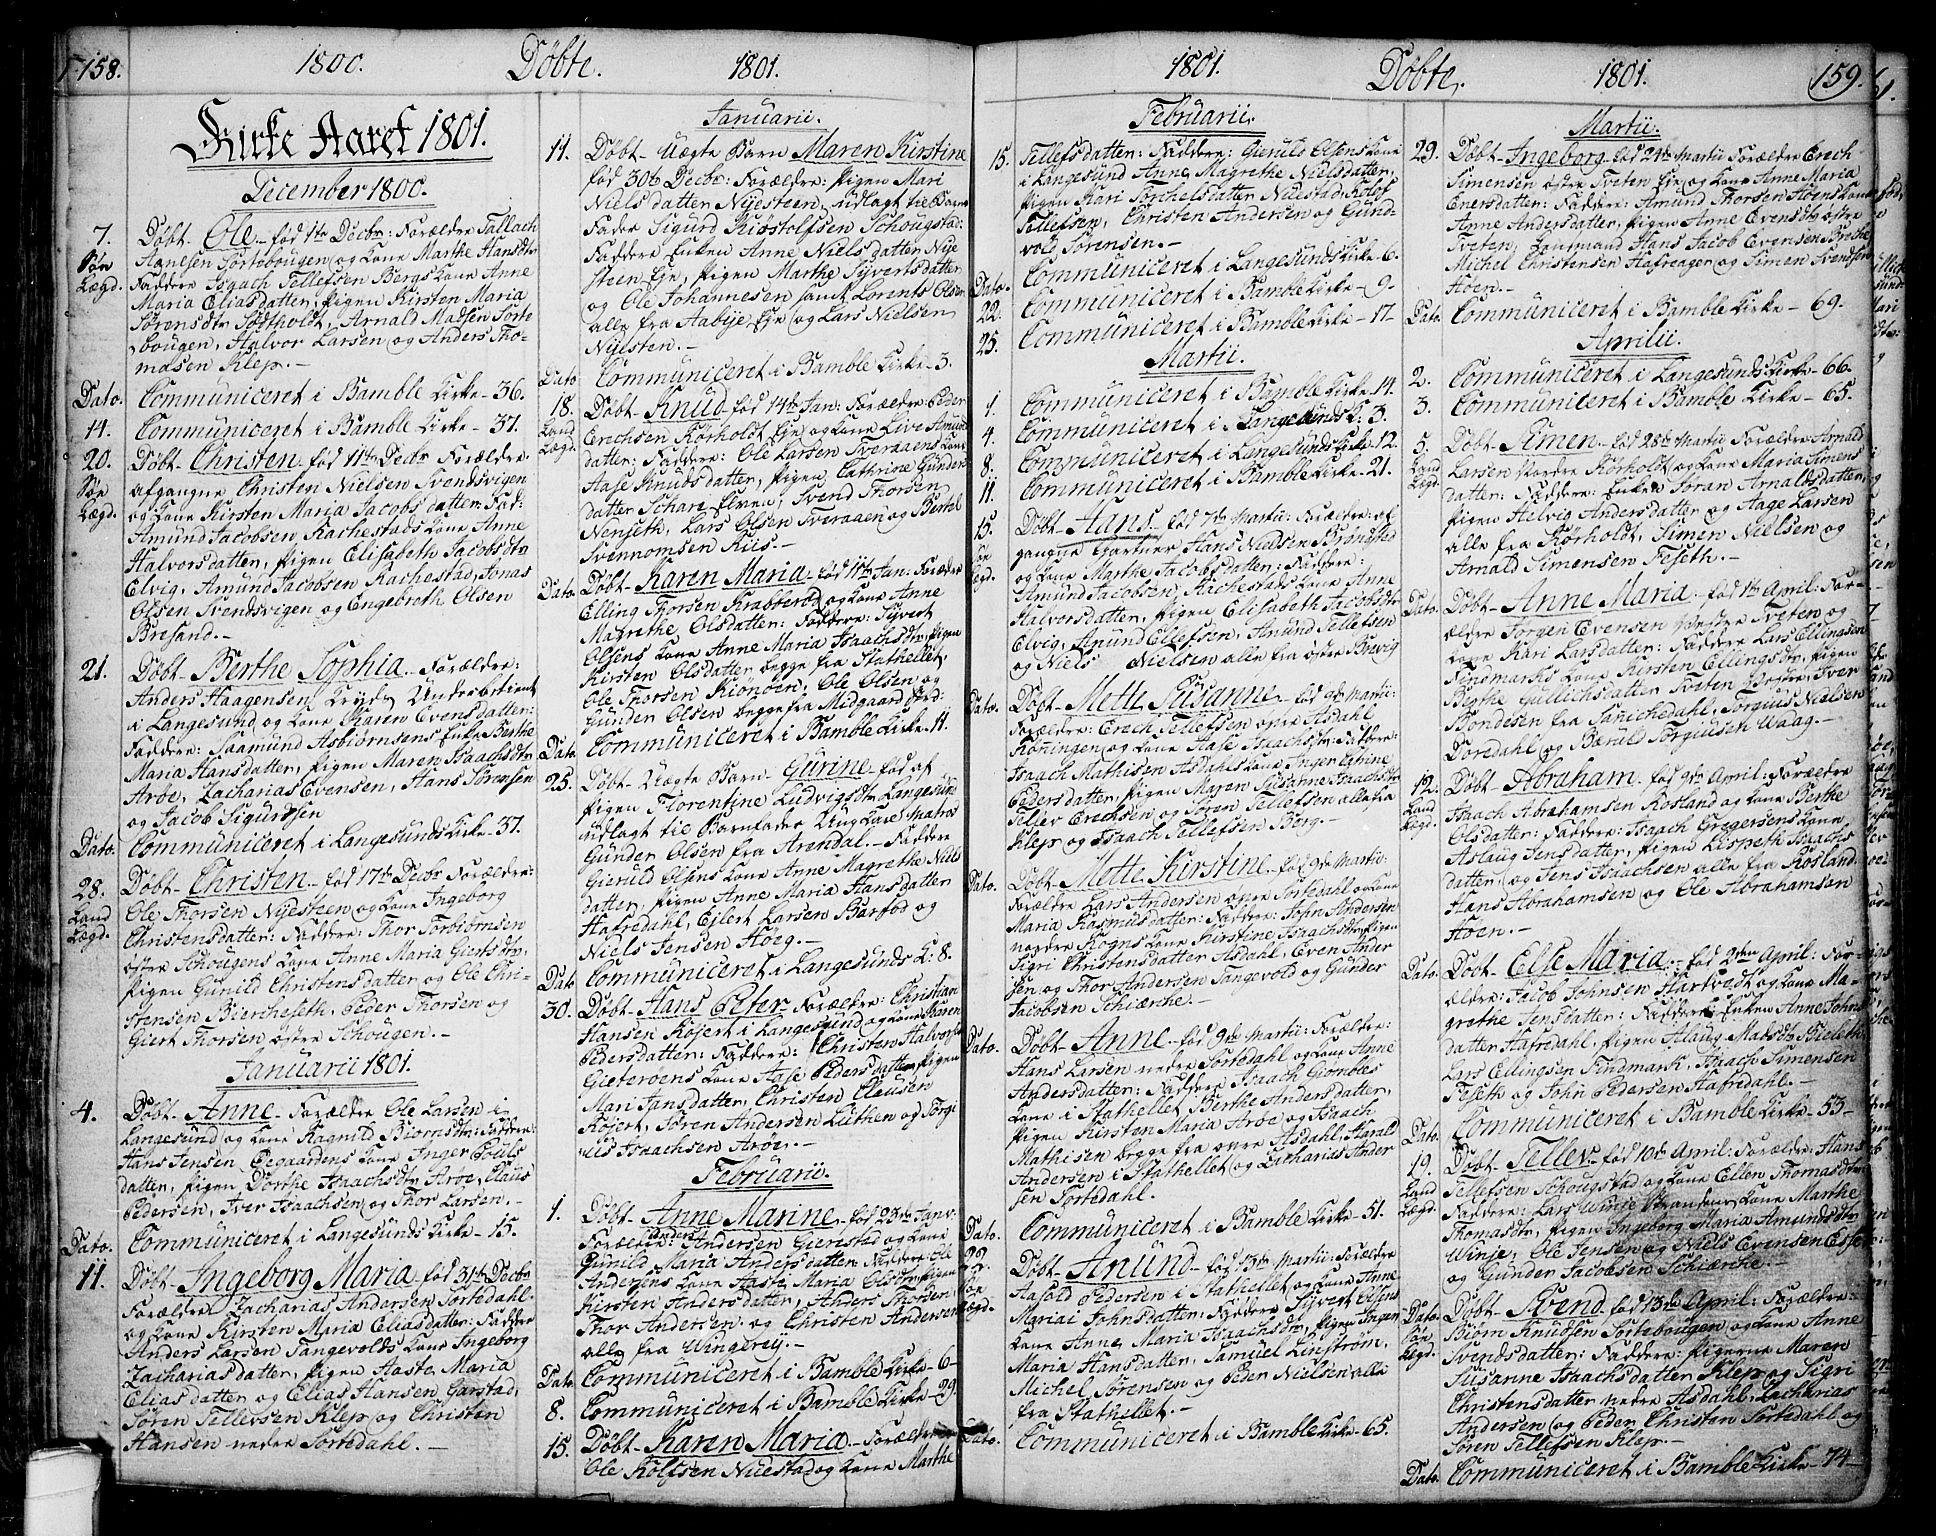 SAKO, Bamble kirkebøker, F/Fa/L0002: Ministerialbok nr. I 2, 1775-1814, s. 158-159